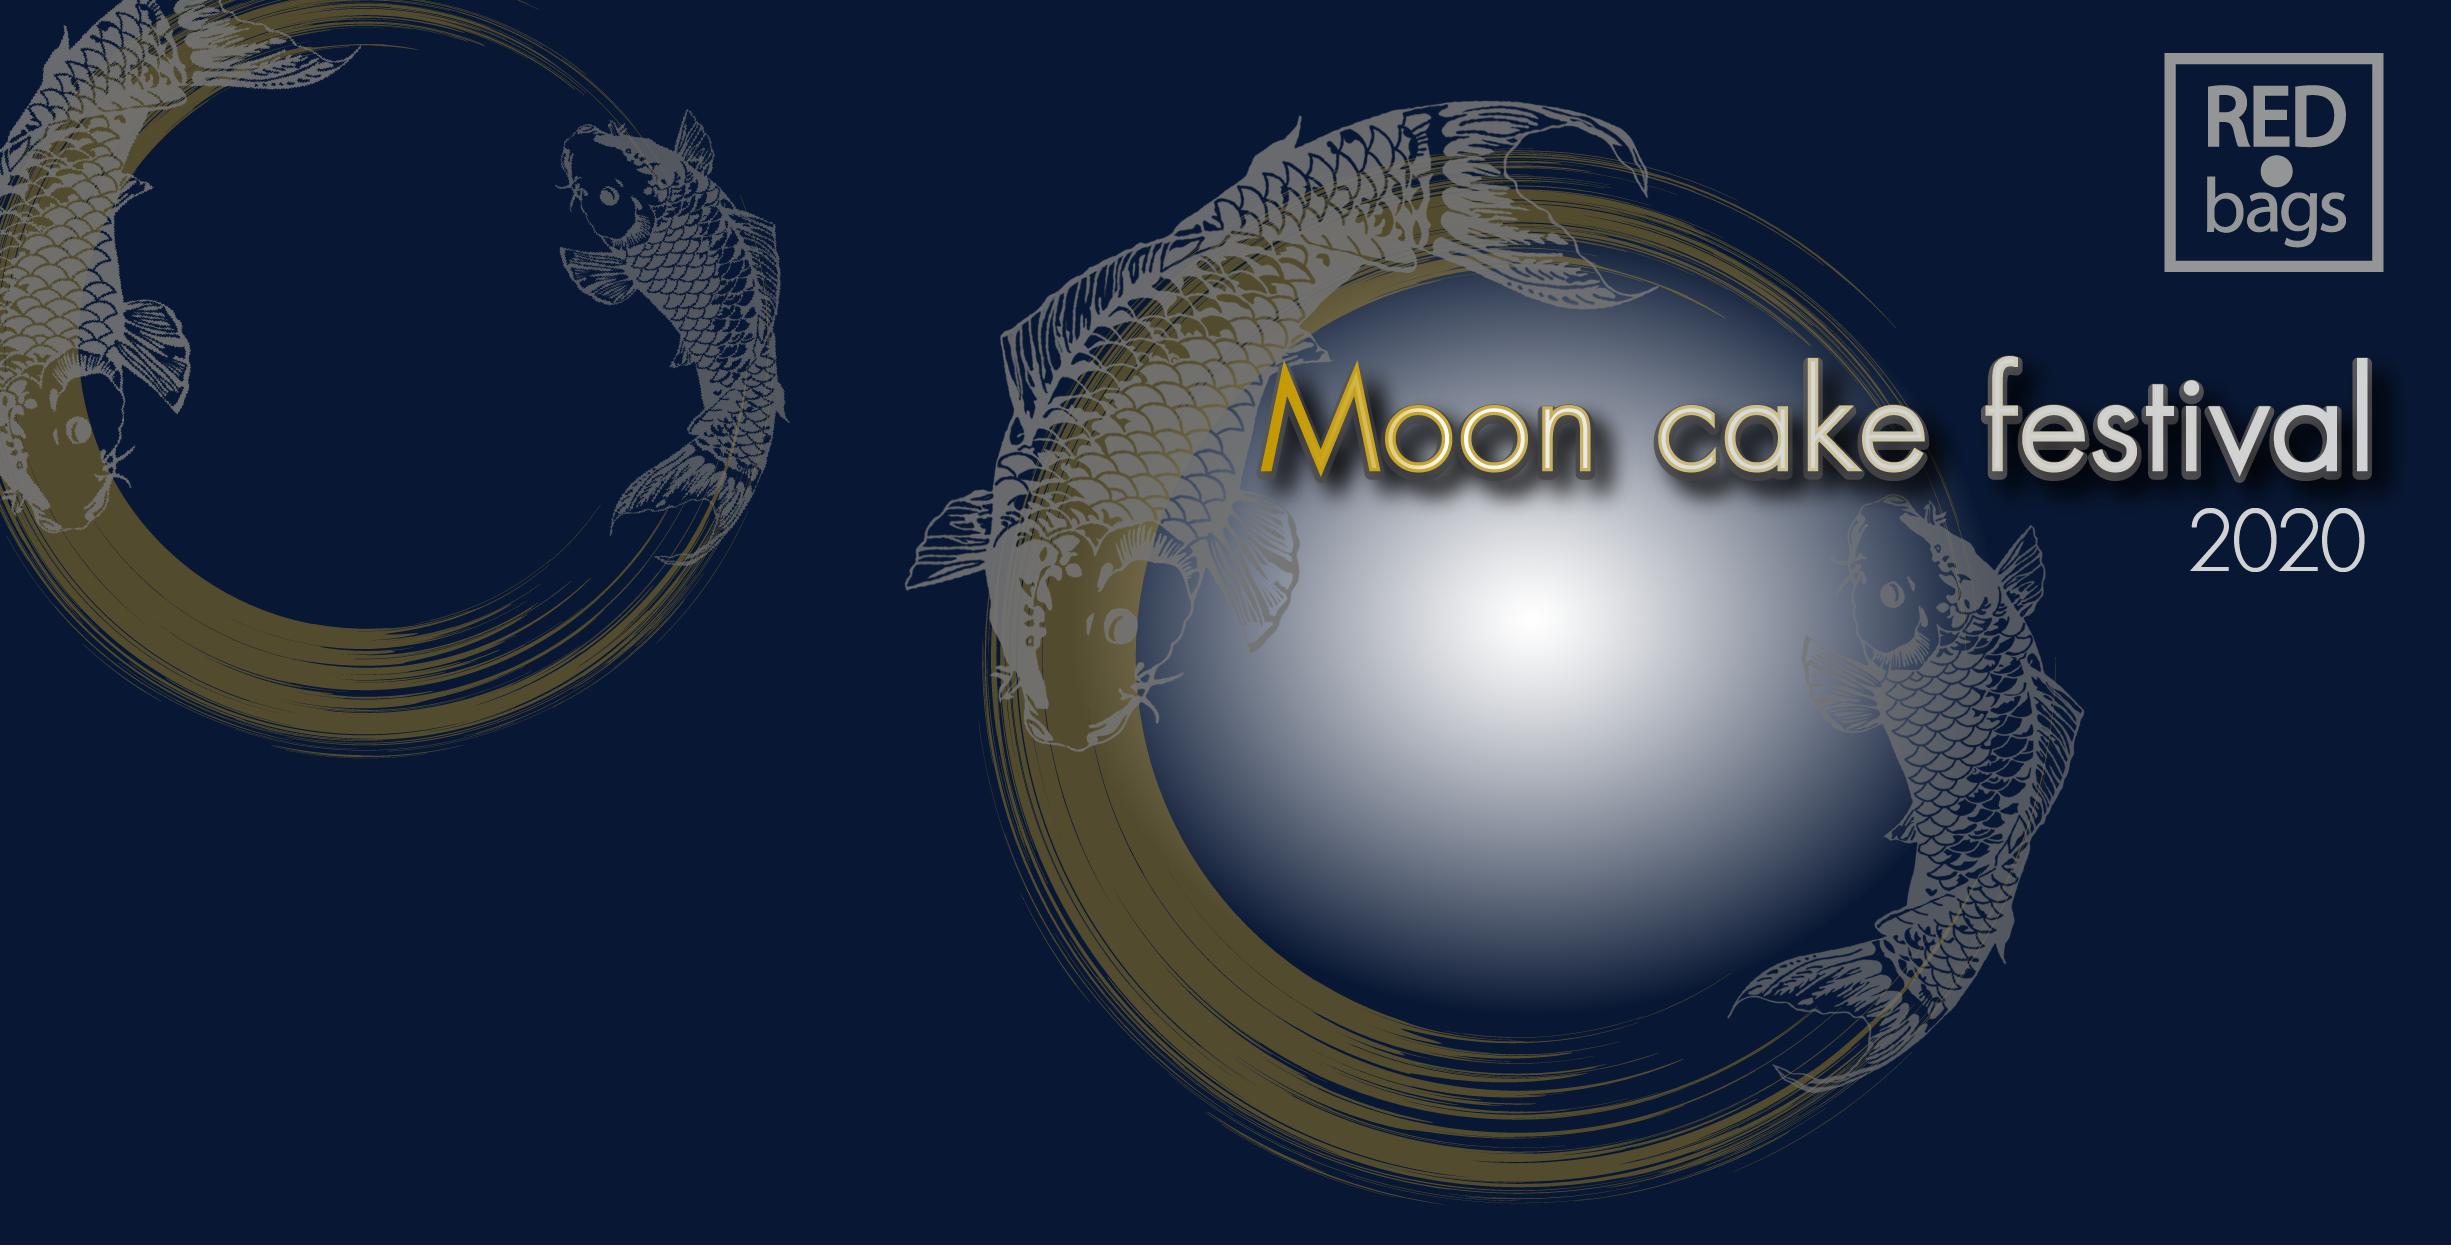 Moon Cake Festival 2020 bags cover